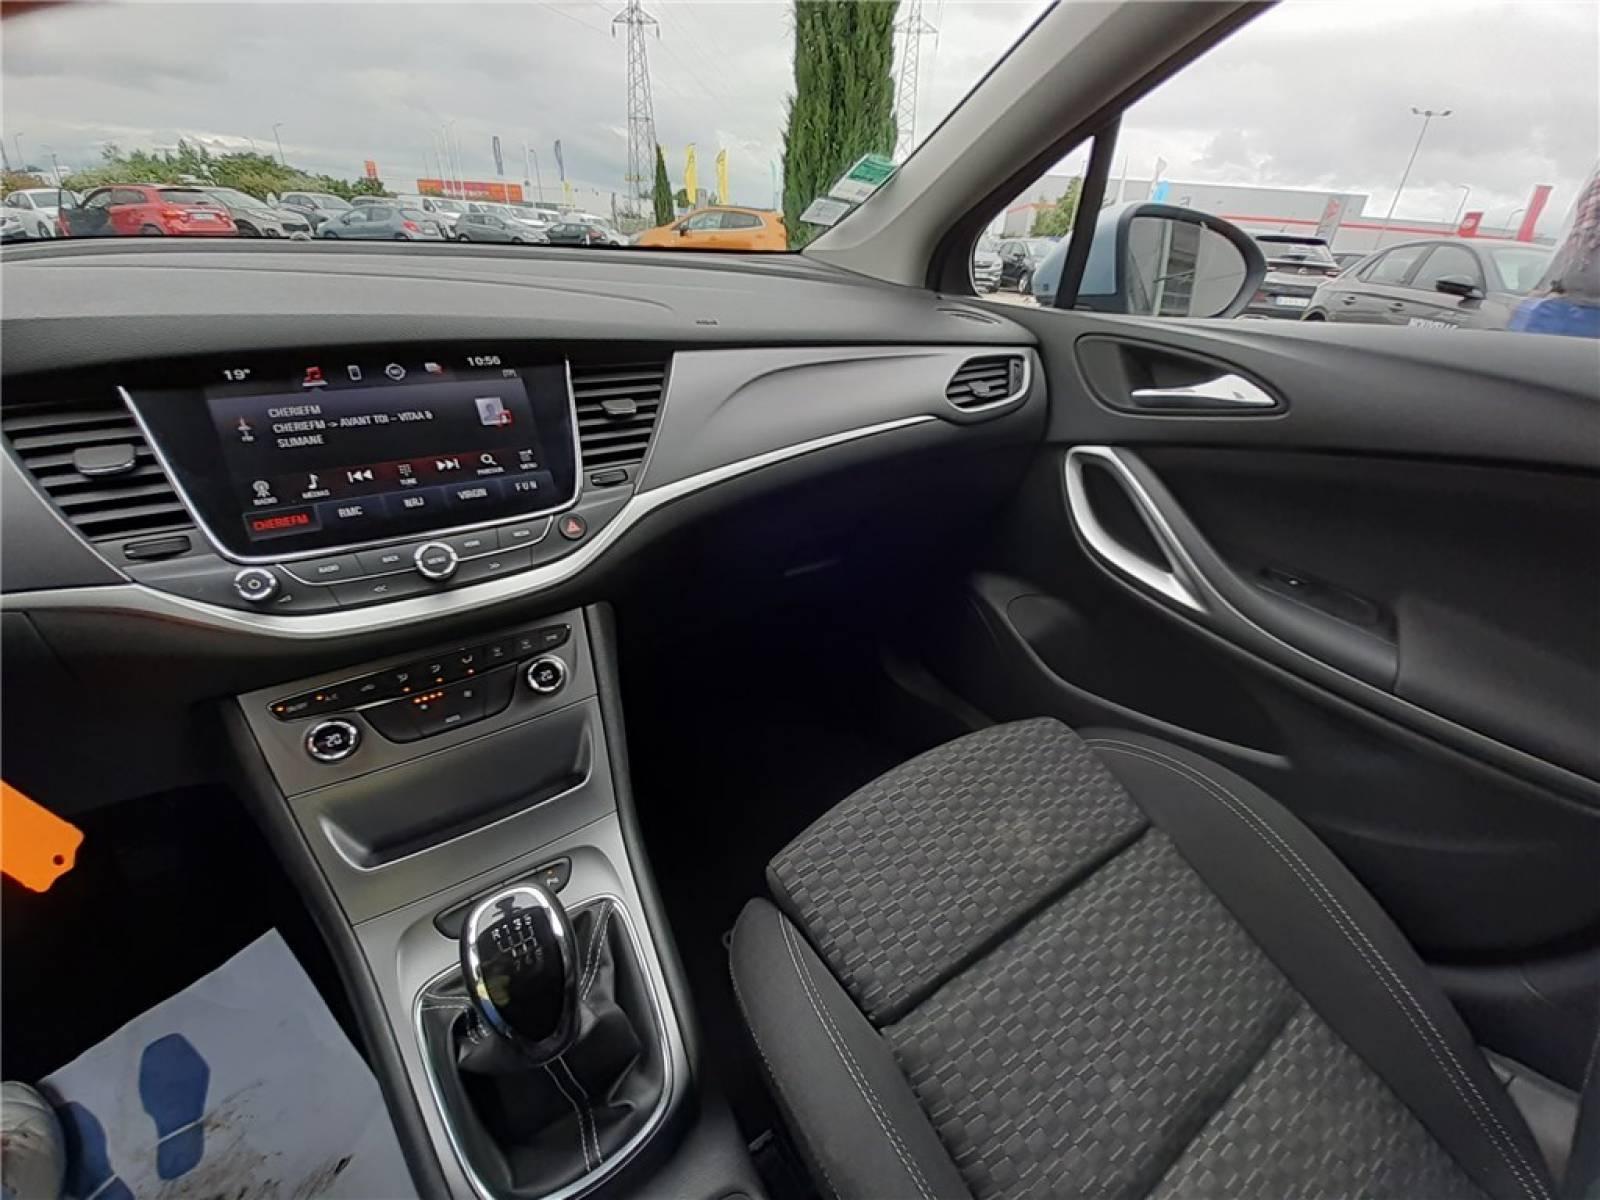 OPEL Astra Sports Tourer 1.6 CDTI 110 ch - véhicule d'occasion - Groupe Guillet - Opel Magicauto - Chalon-sur-Saône - 71380 - Saint-Marcel - 31